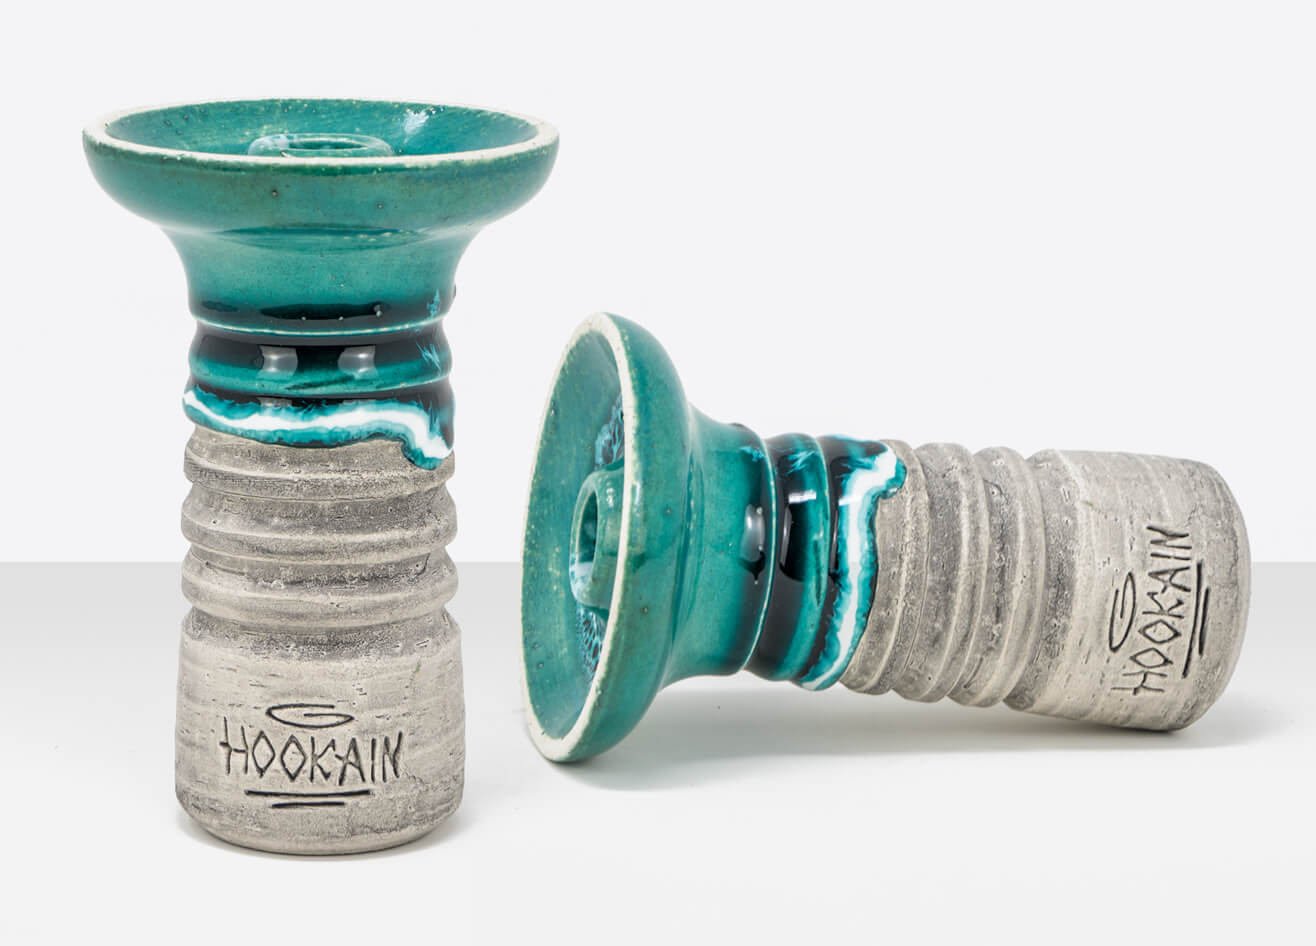 Hookain LuVLiP Phunnel Cool Water